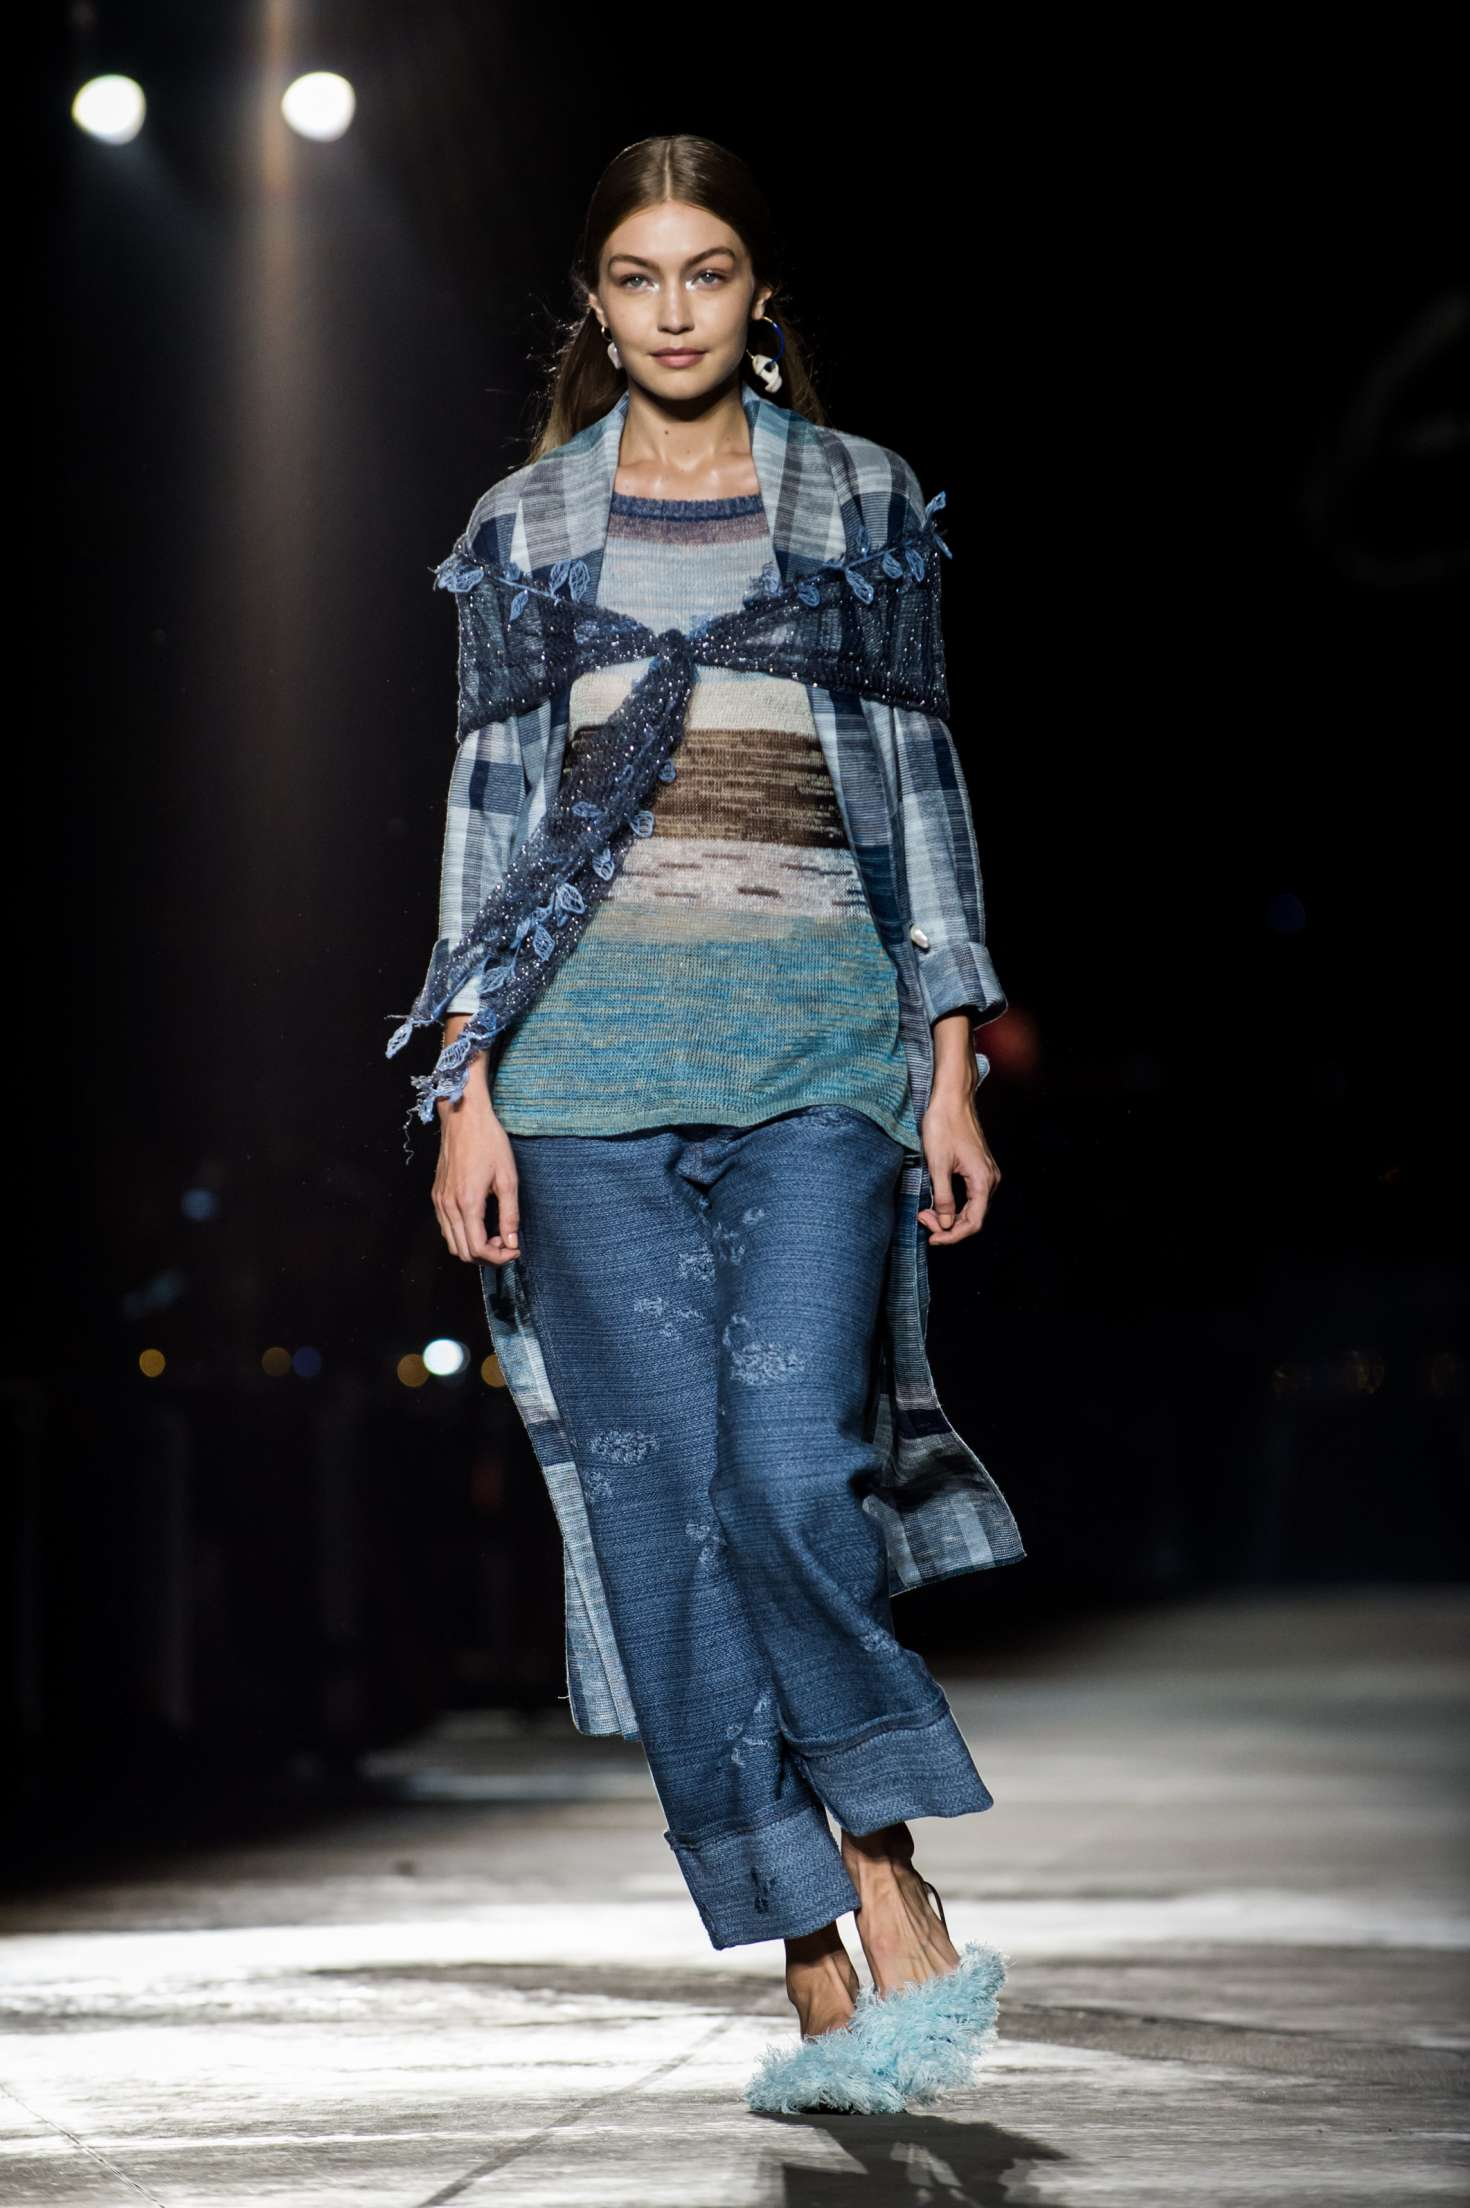 Gigi Hadid – Missoni Runway Show in Milan